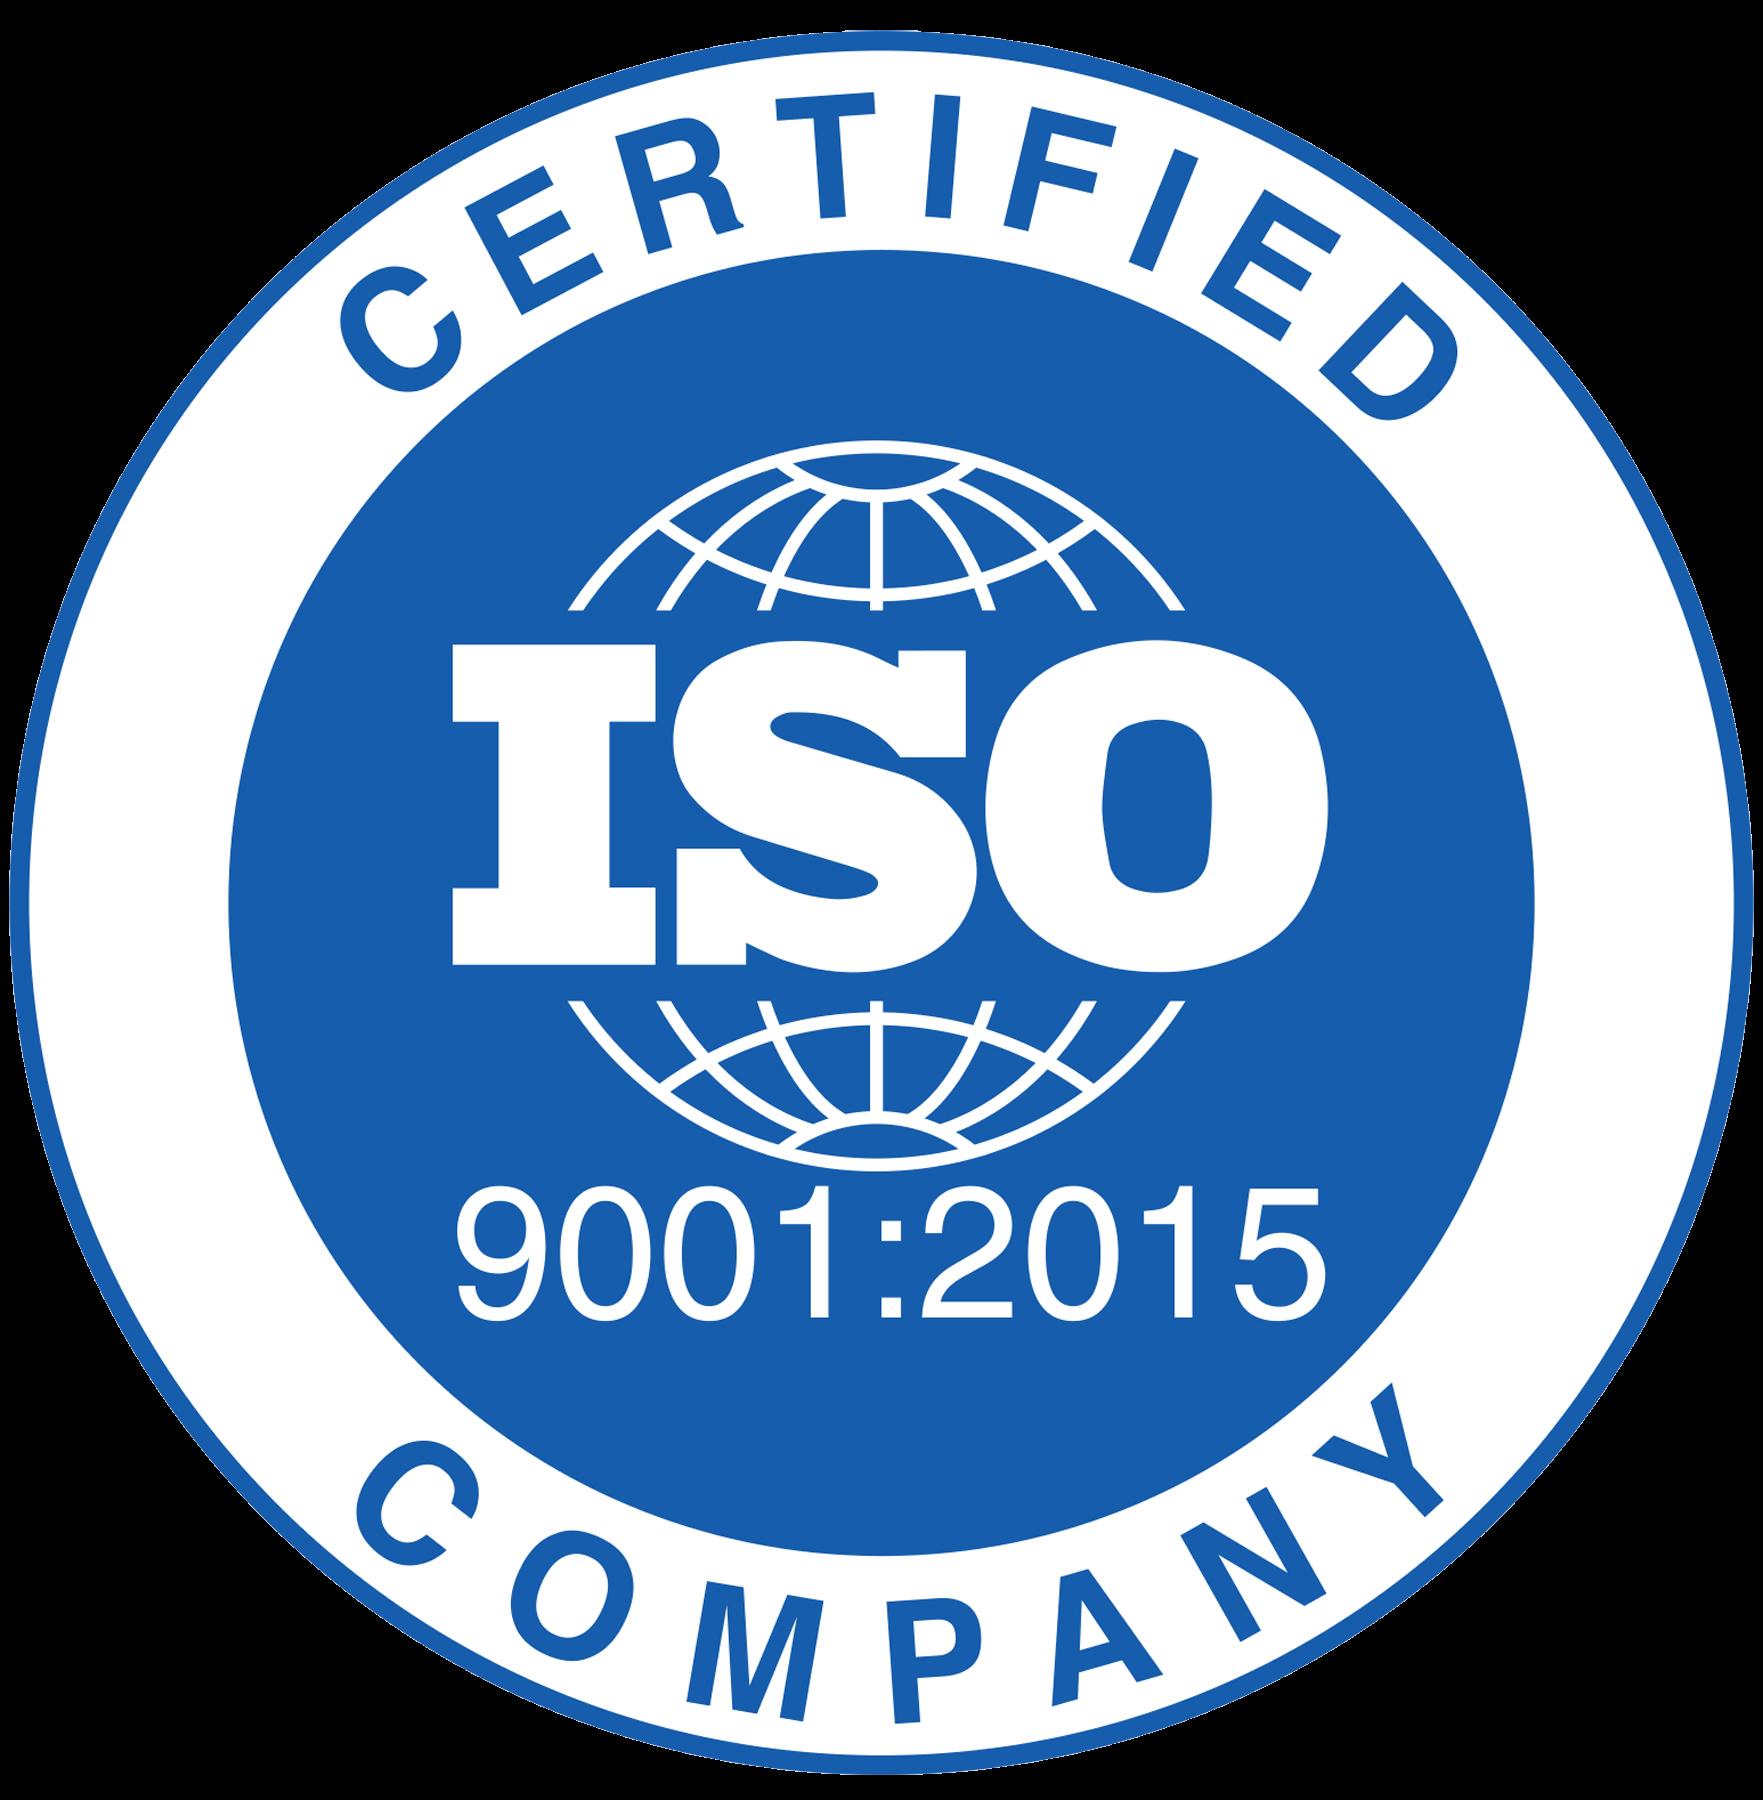 Получен сертификат соответствия (ISO 9001:2015, ISO 14001:2015, OHSAS 18001:2007)